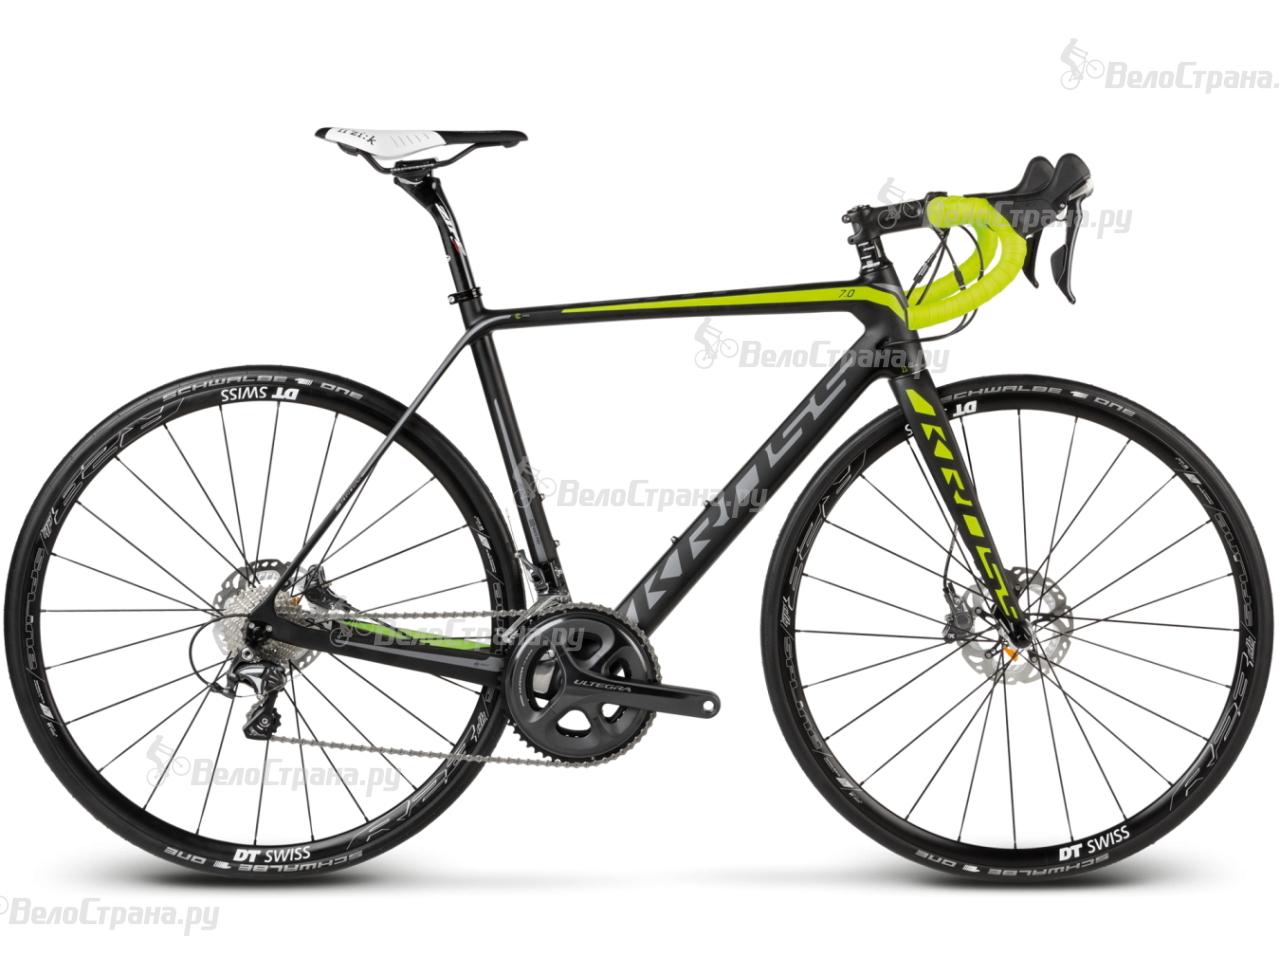 Велосипед Kross VENTO 7.0 (2017) велосипед kross vento 6 0 2017